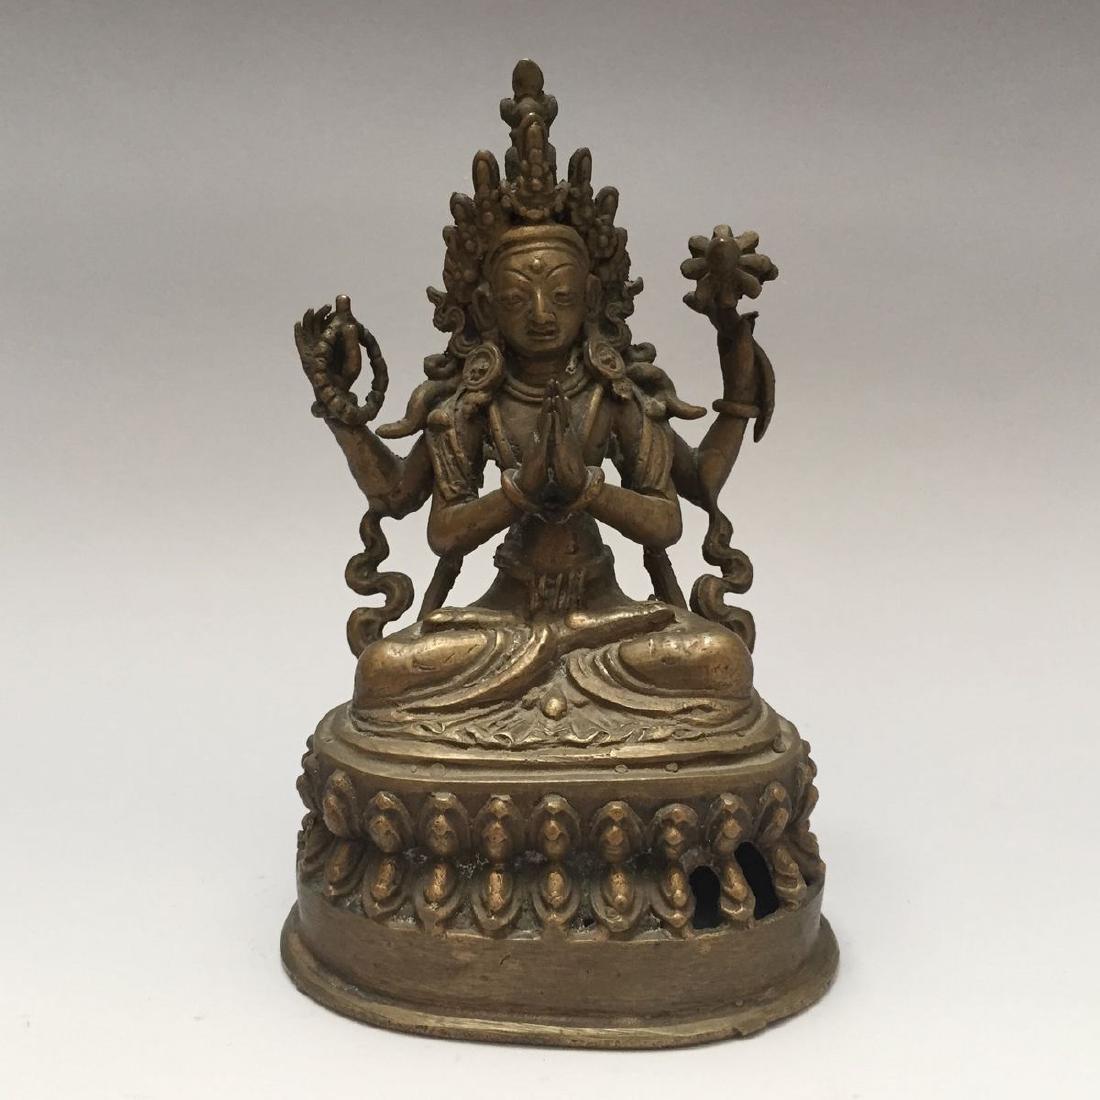 ANTIQUE TIBETAN BRONZE BUDDHA FIGURE